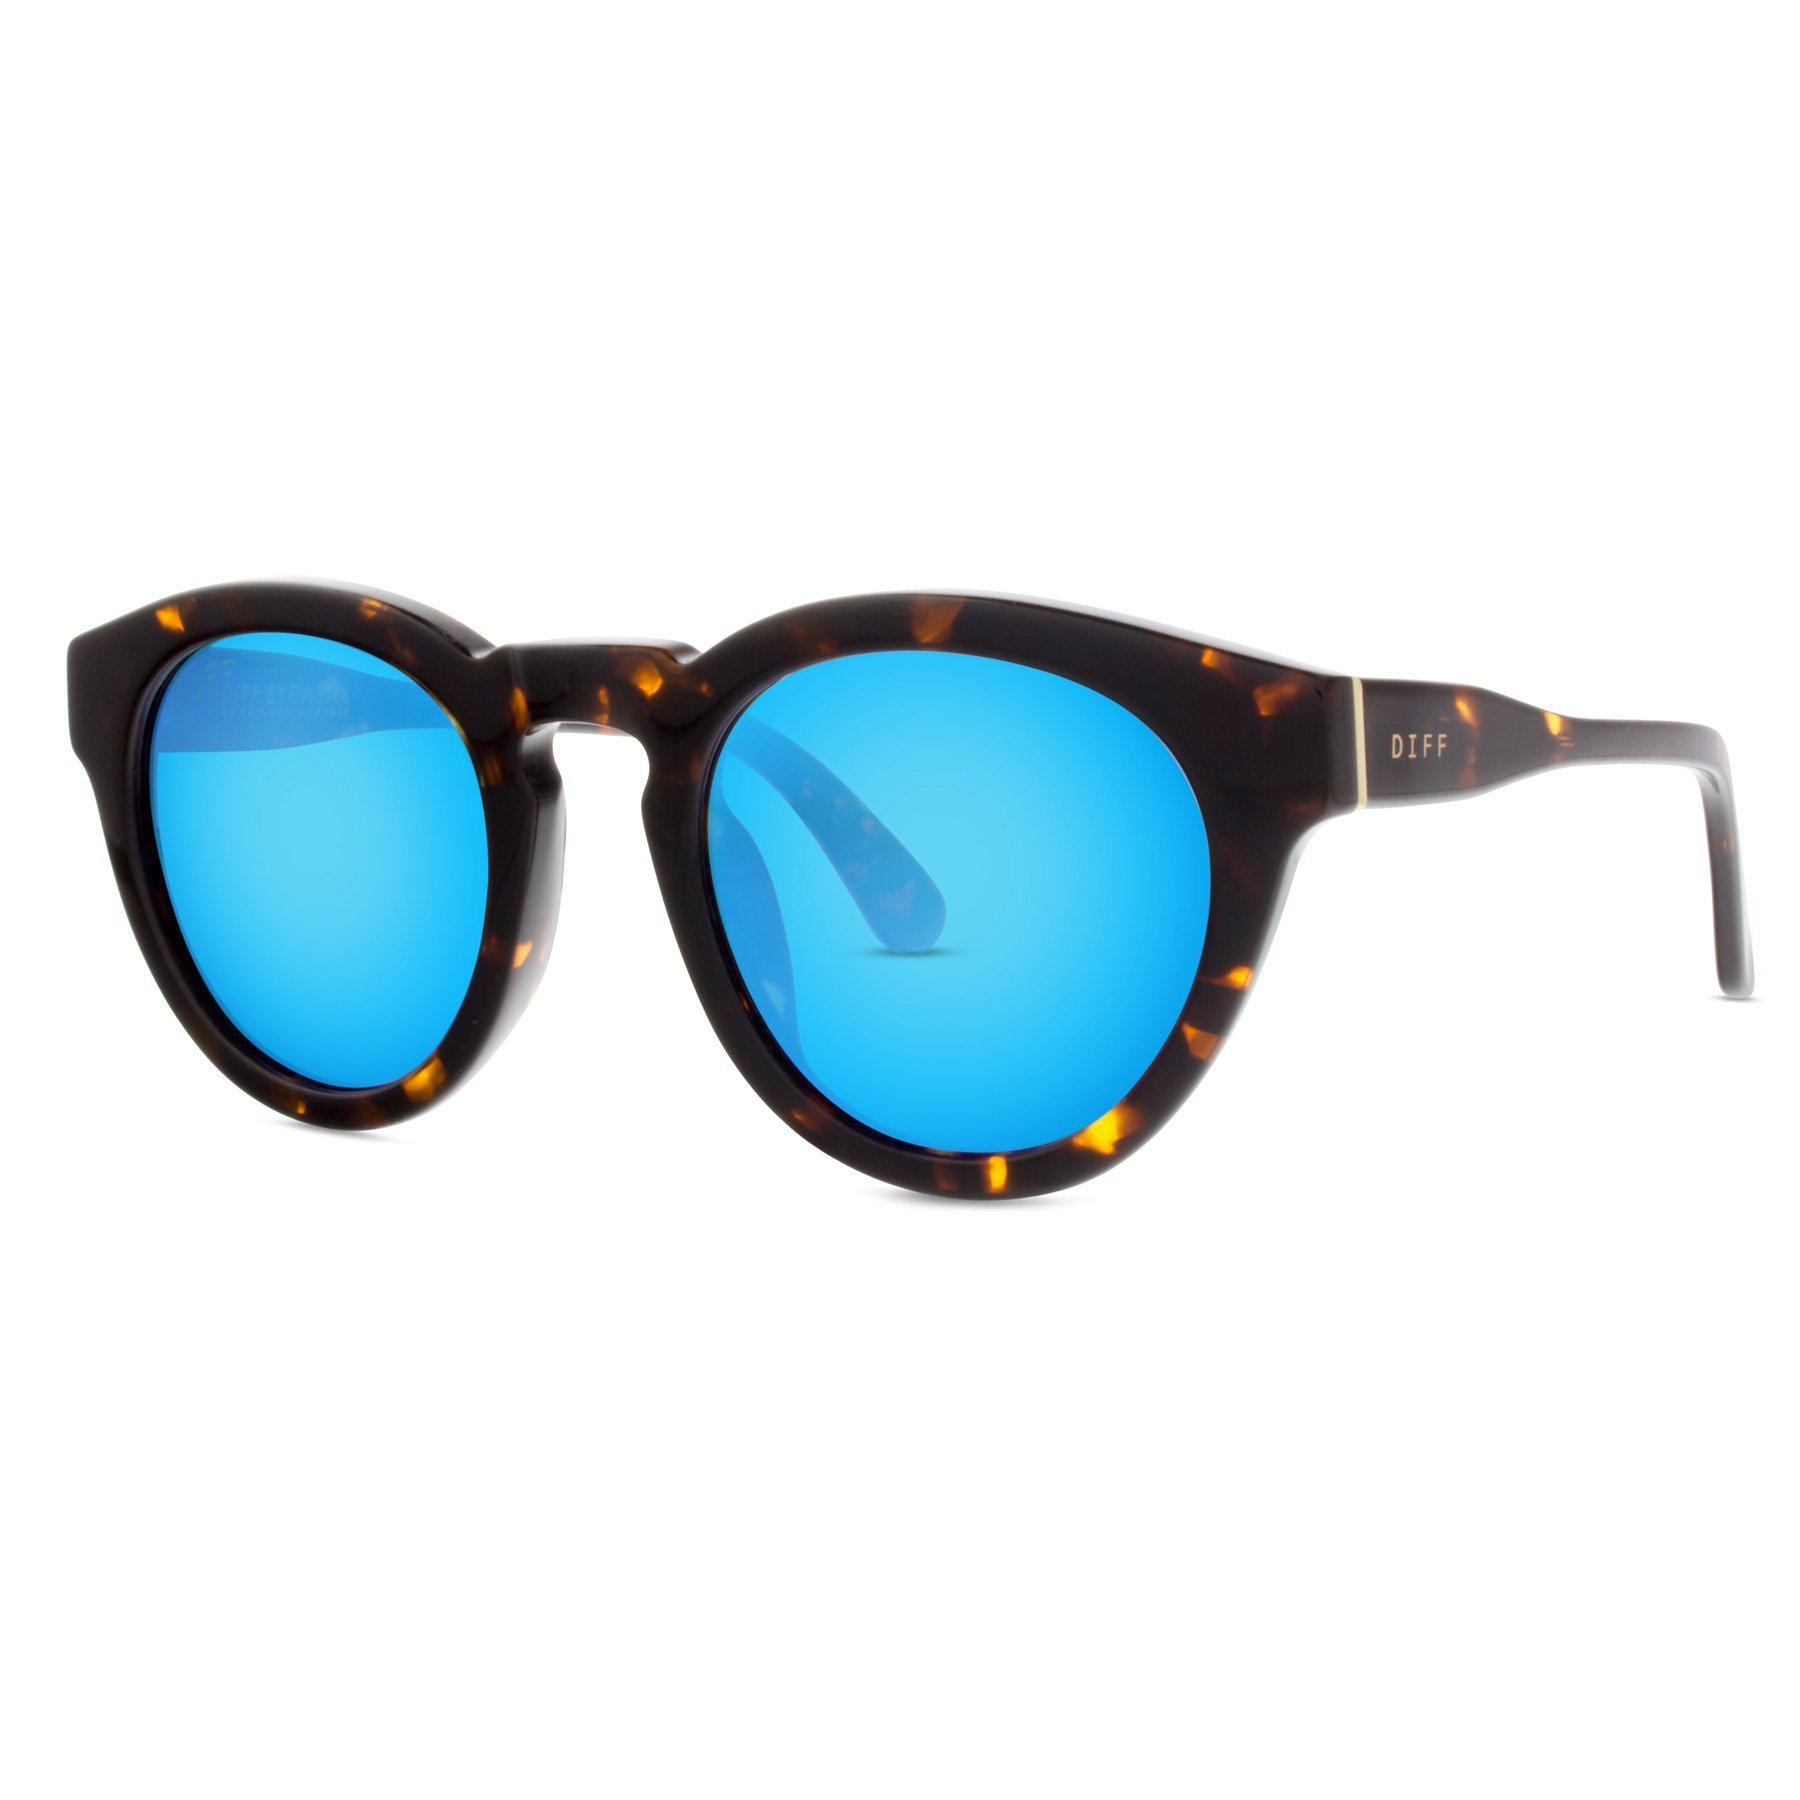 0a5bdc179e Lyst - DIFF Dime Ll - Tortoise + Blue Mirror in Blue